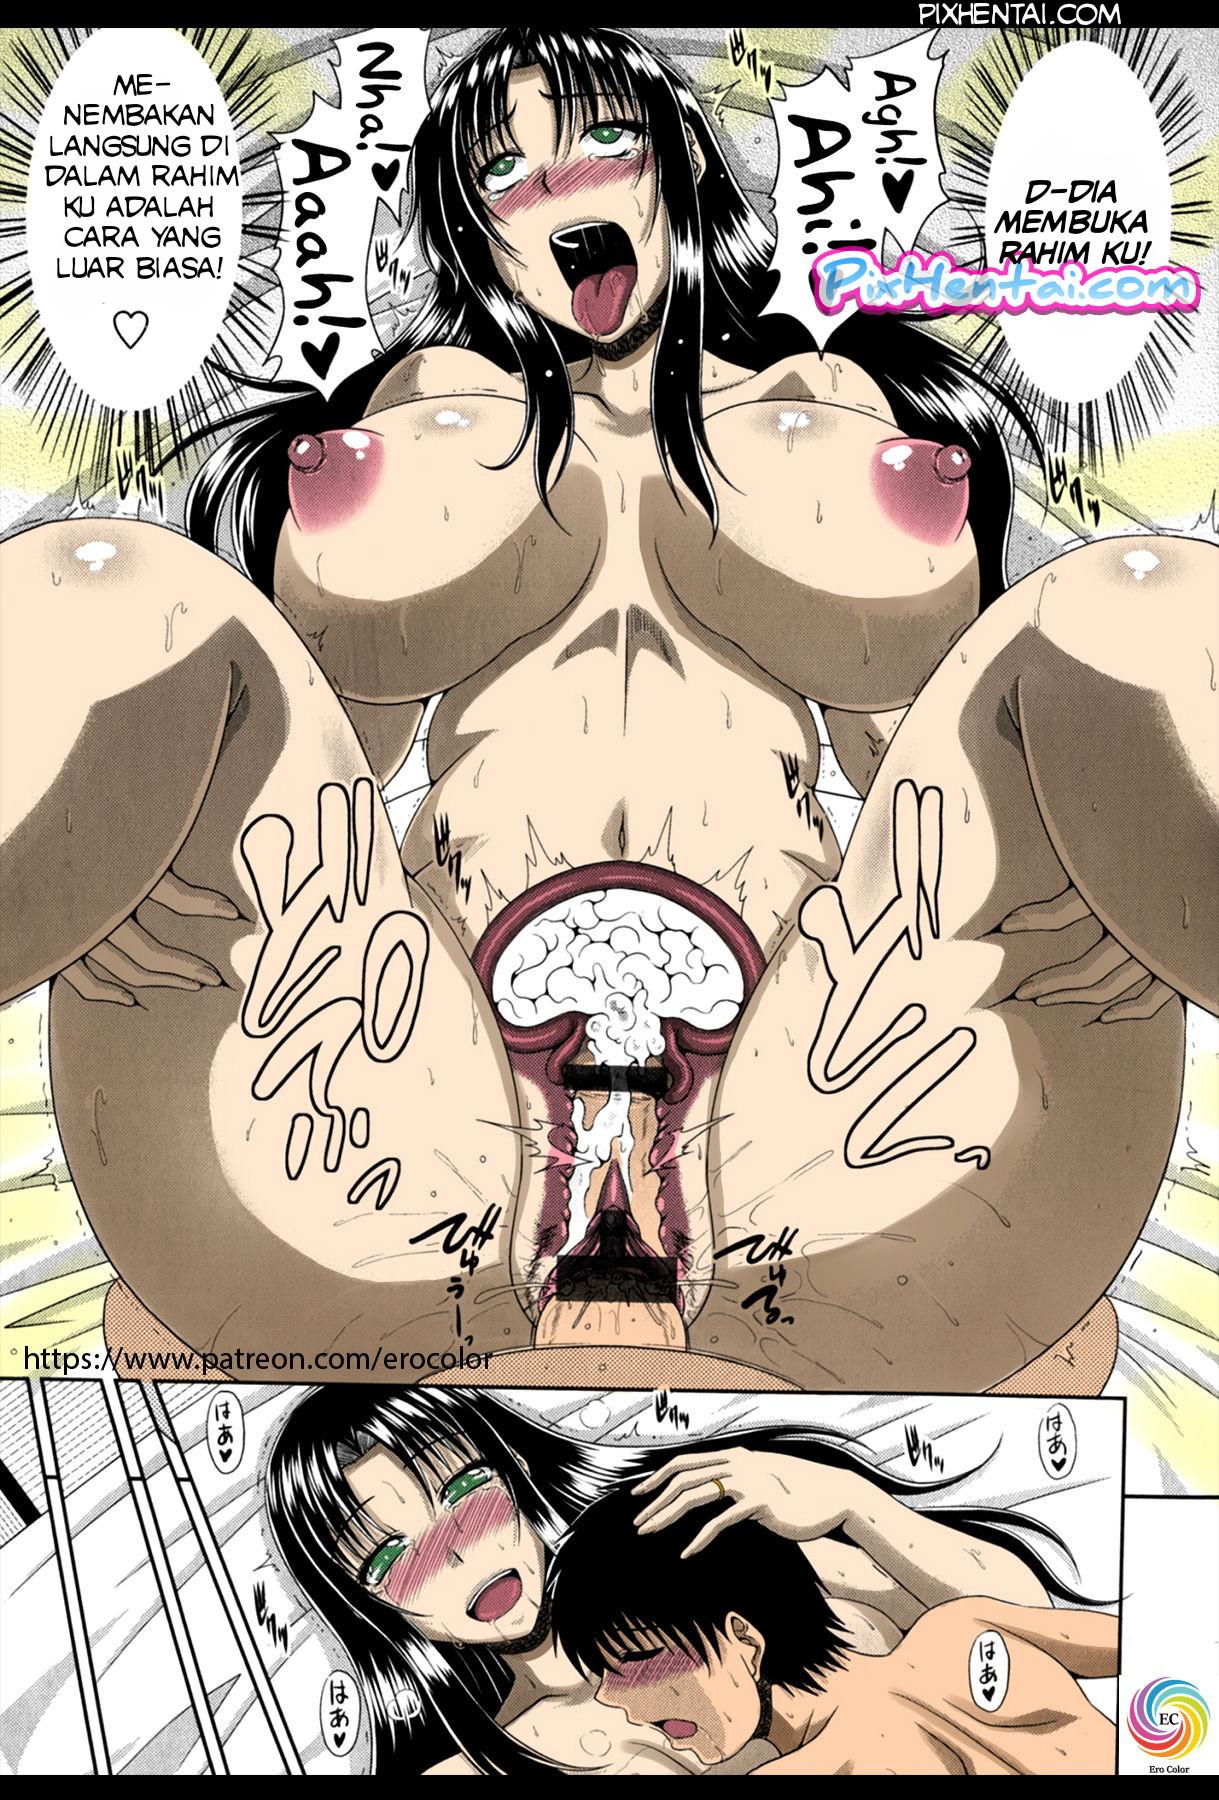 Komik Hentai Mandi dengan Ibunya Teman yang Bohai Manga Sex Porn Doujin XXX Bokep 20